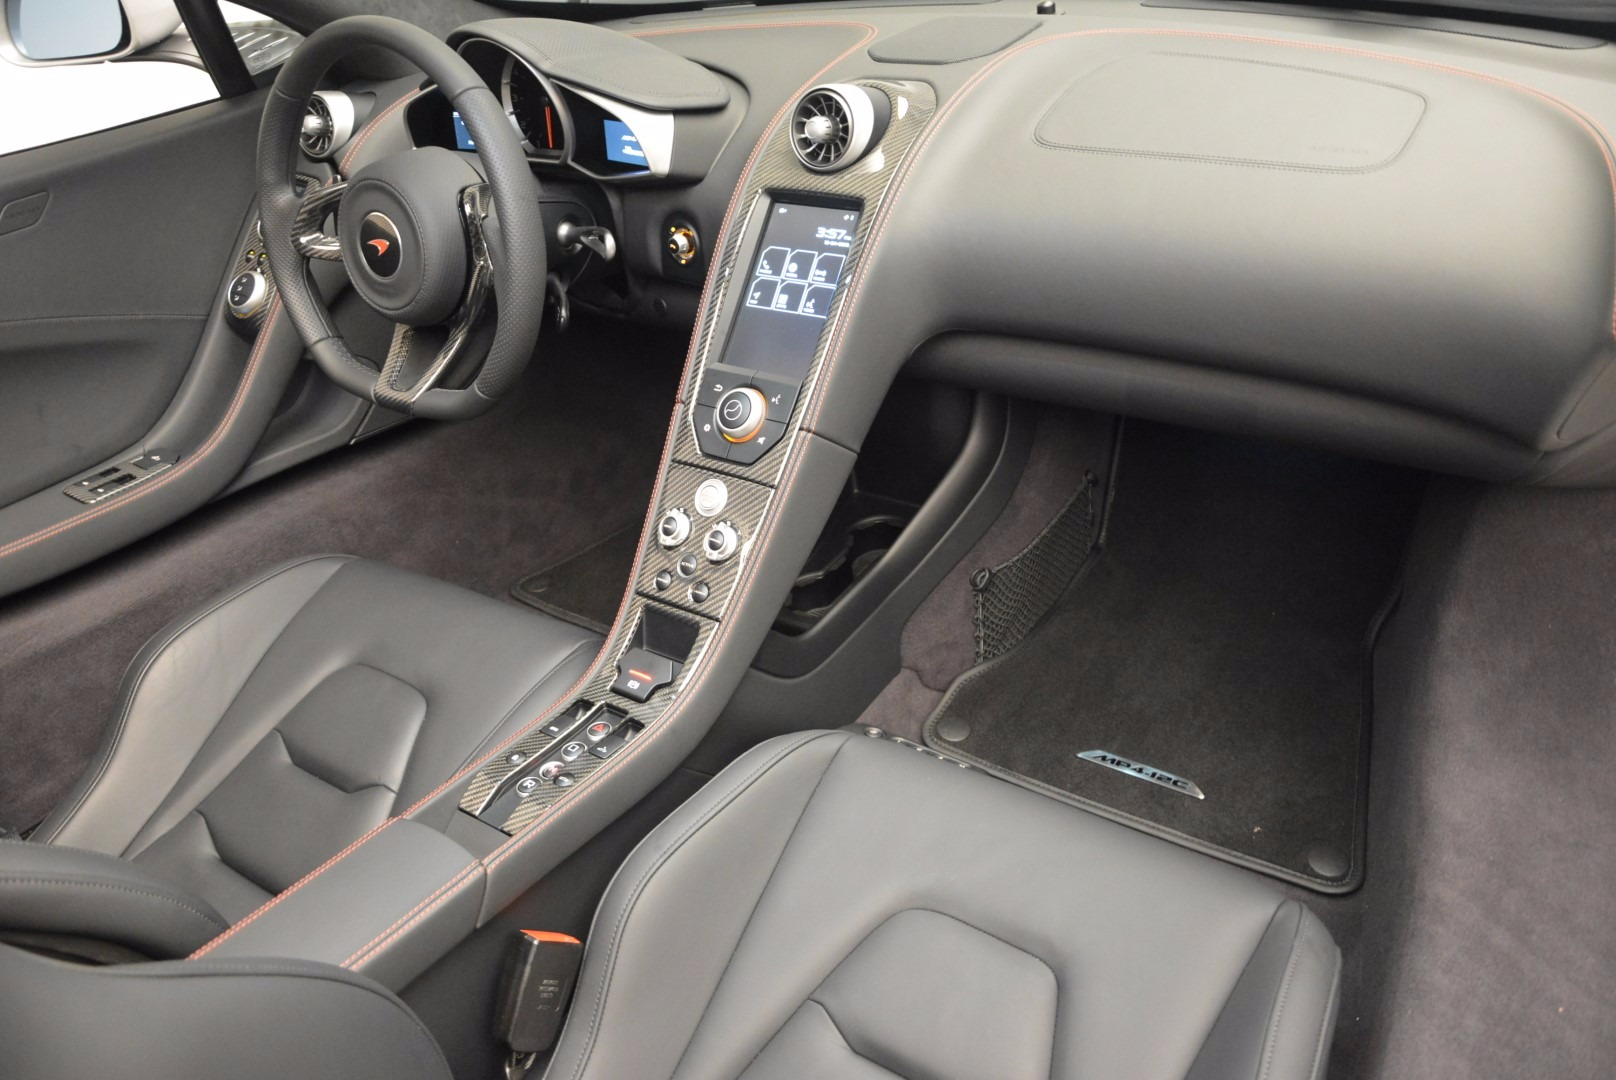 Used 2014 McLaren MP4-12C Spider  For Sale In Greenwich, CT. Alfa Romeo of Greenwich, 3089 627_p26